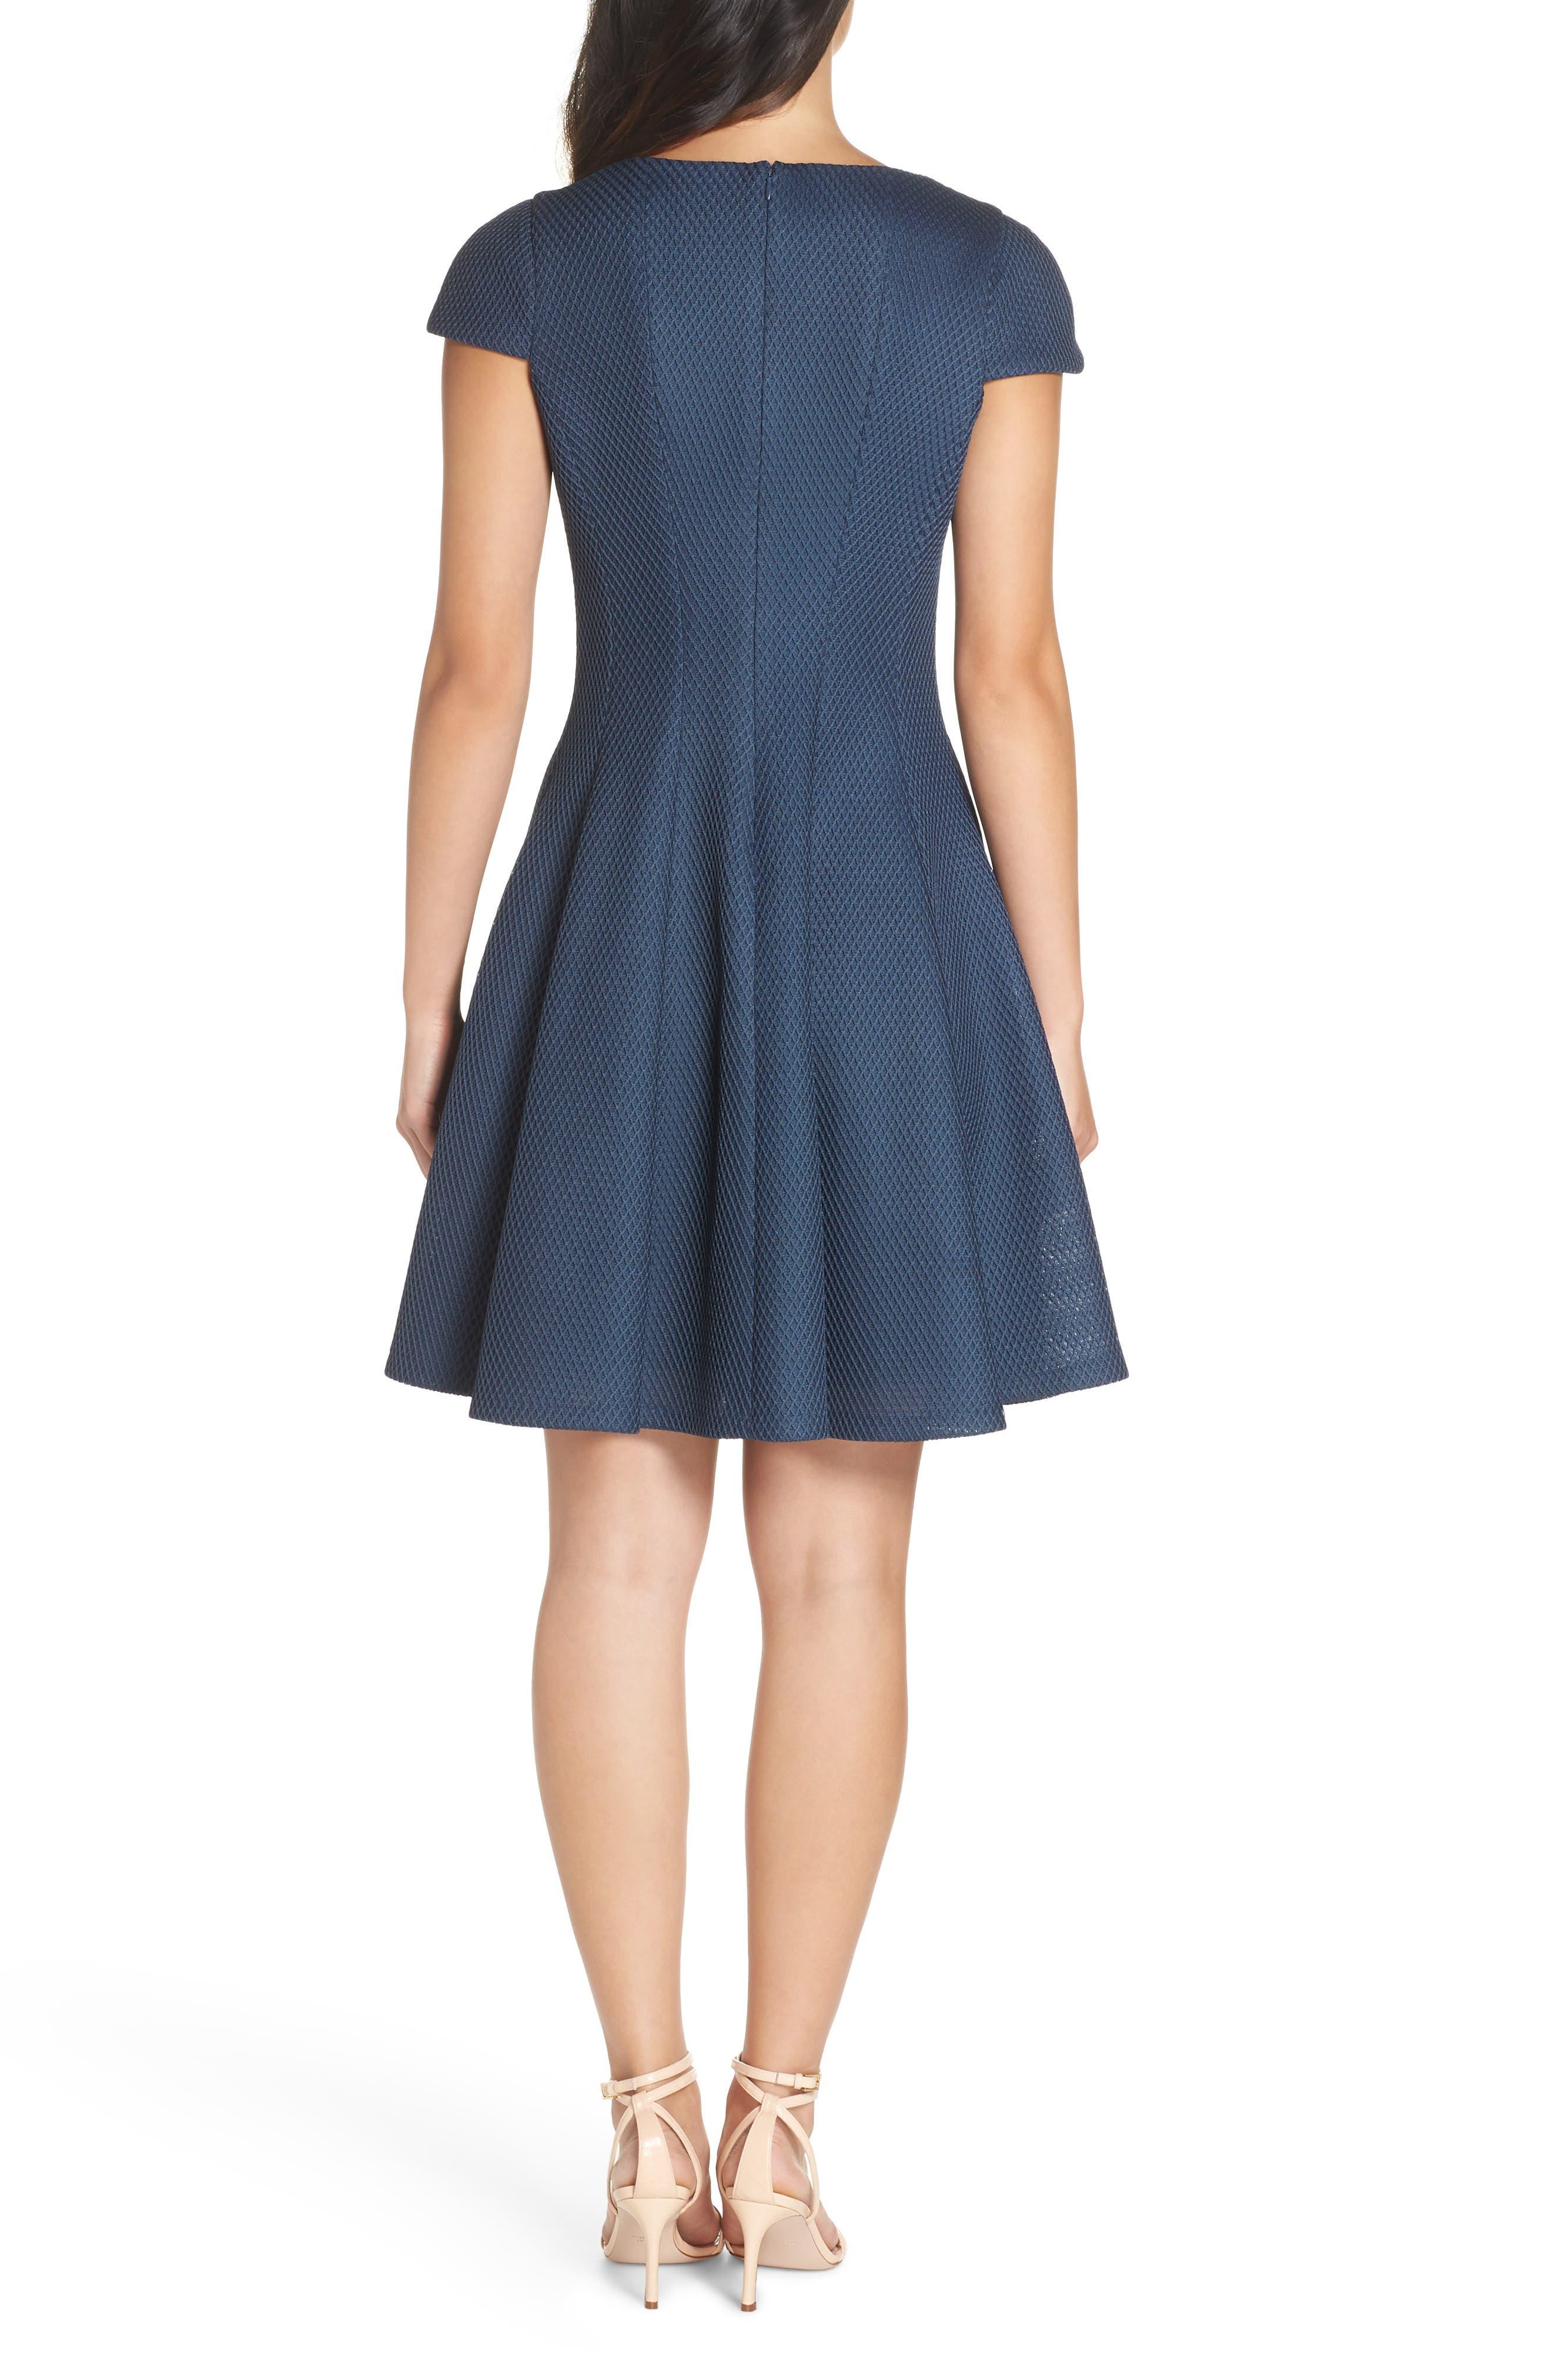 JULIA JORDAN, Fit & Flare Dress, Alternate thumbnail 2, color, 445